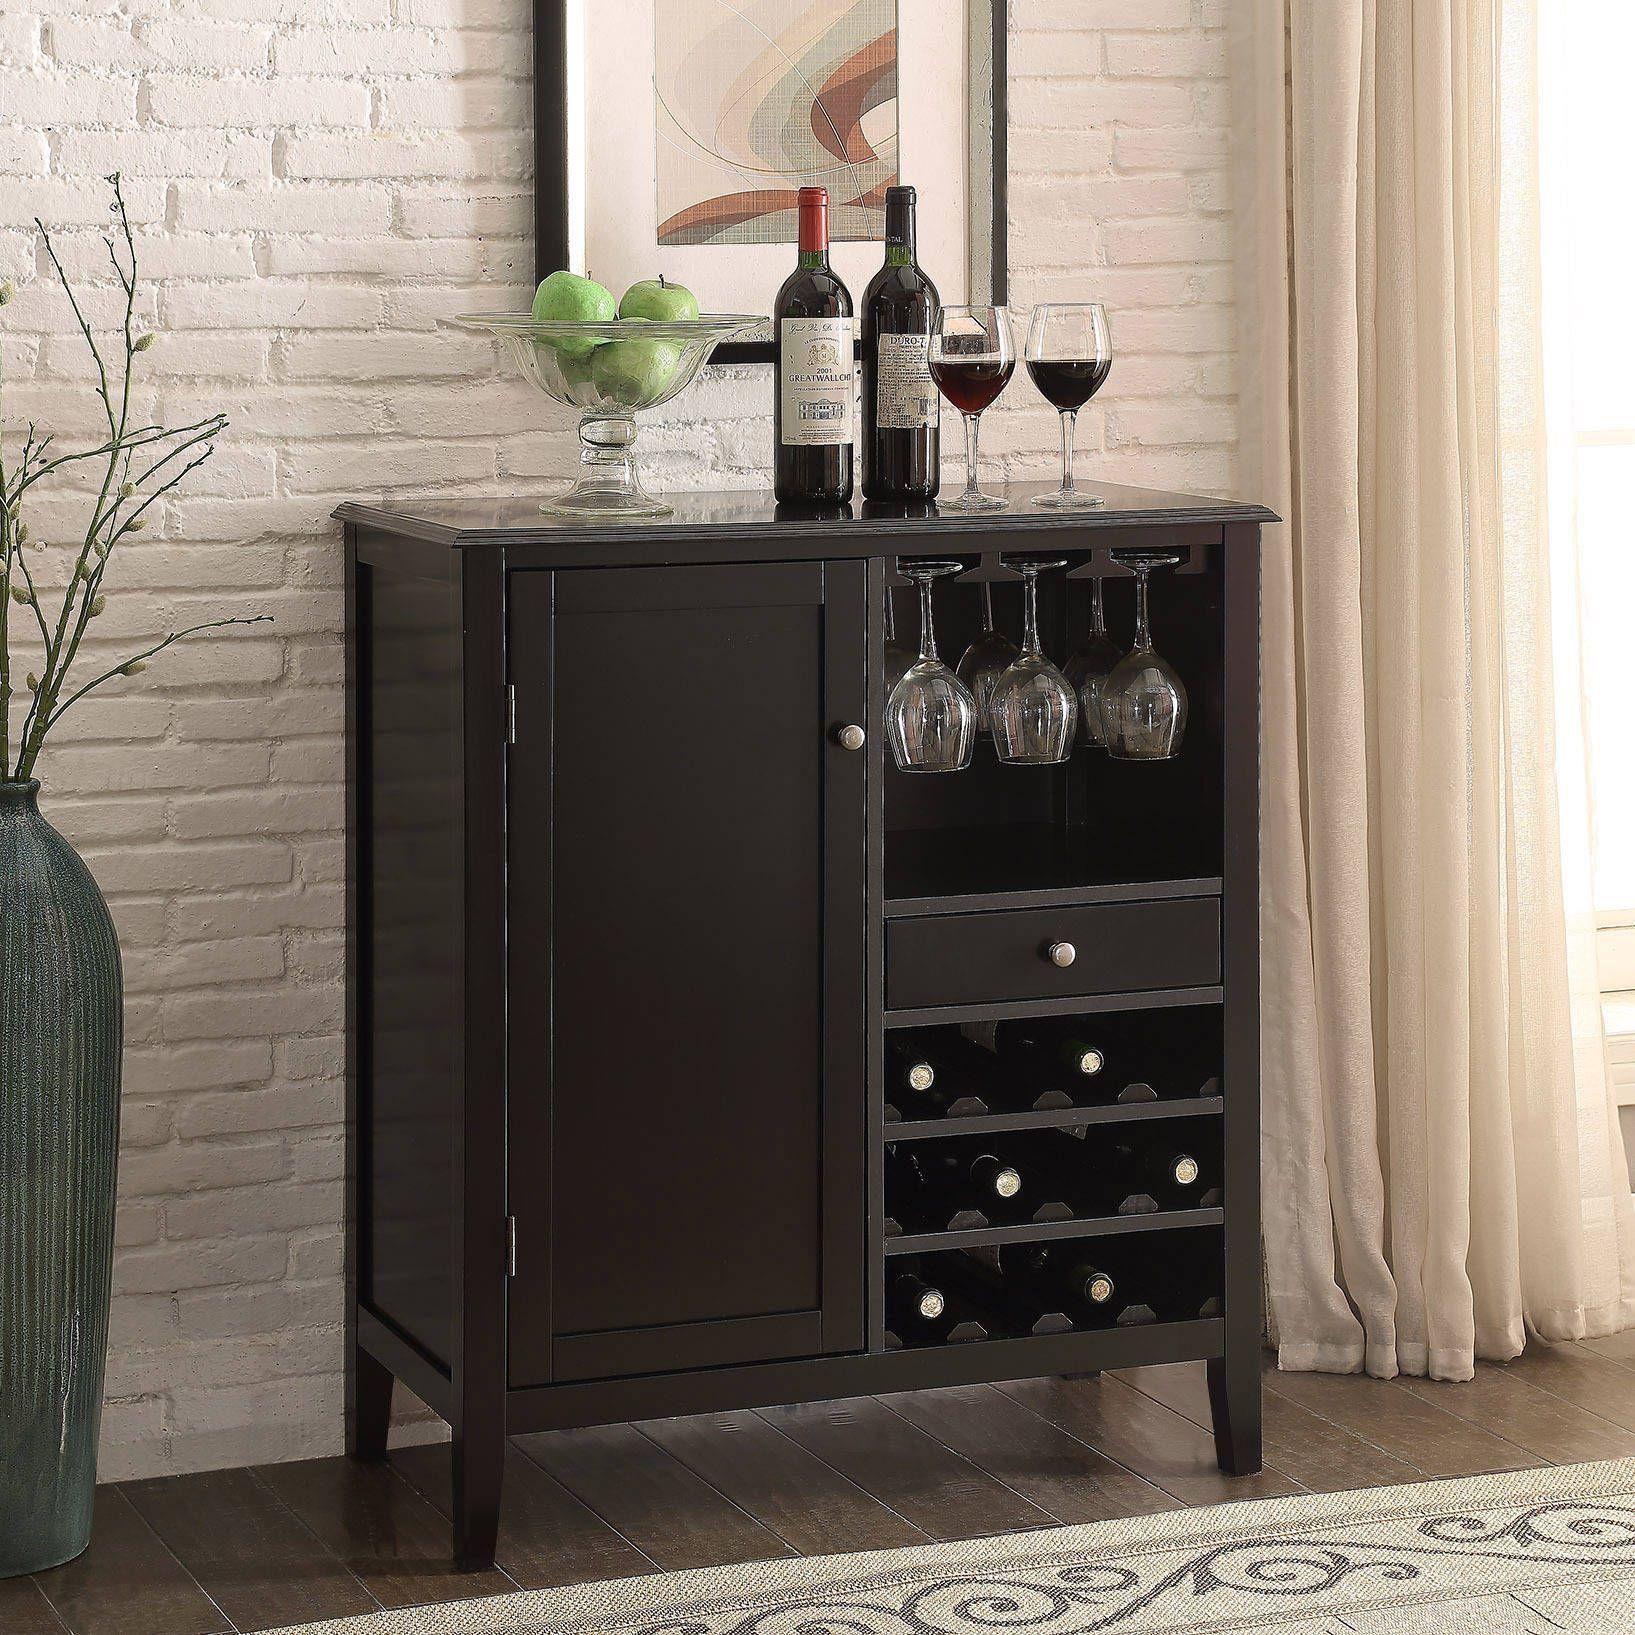 Briarwood Home Decor 36 inch Black 12 bottle Wine Storage Cabinet